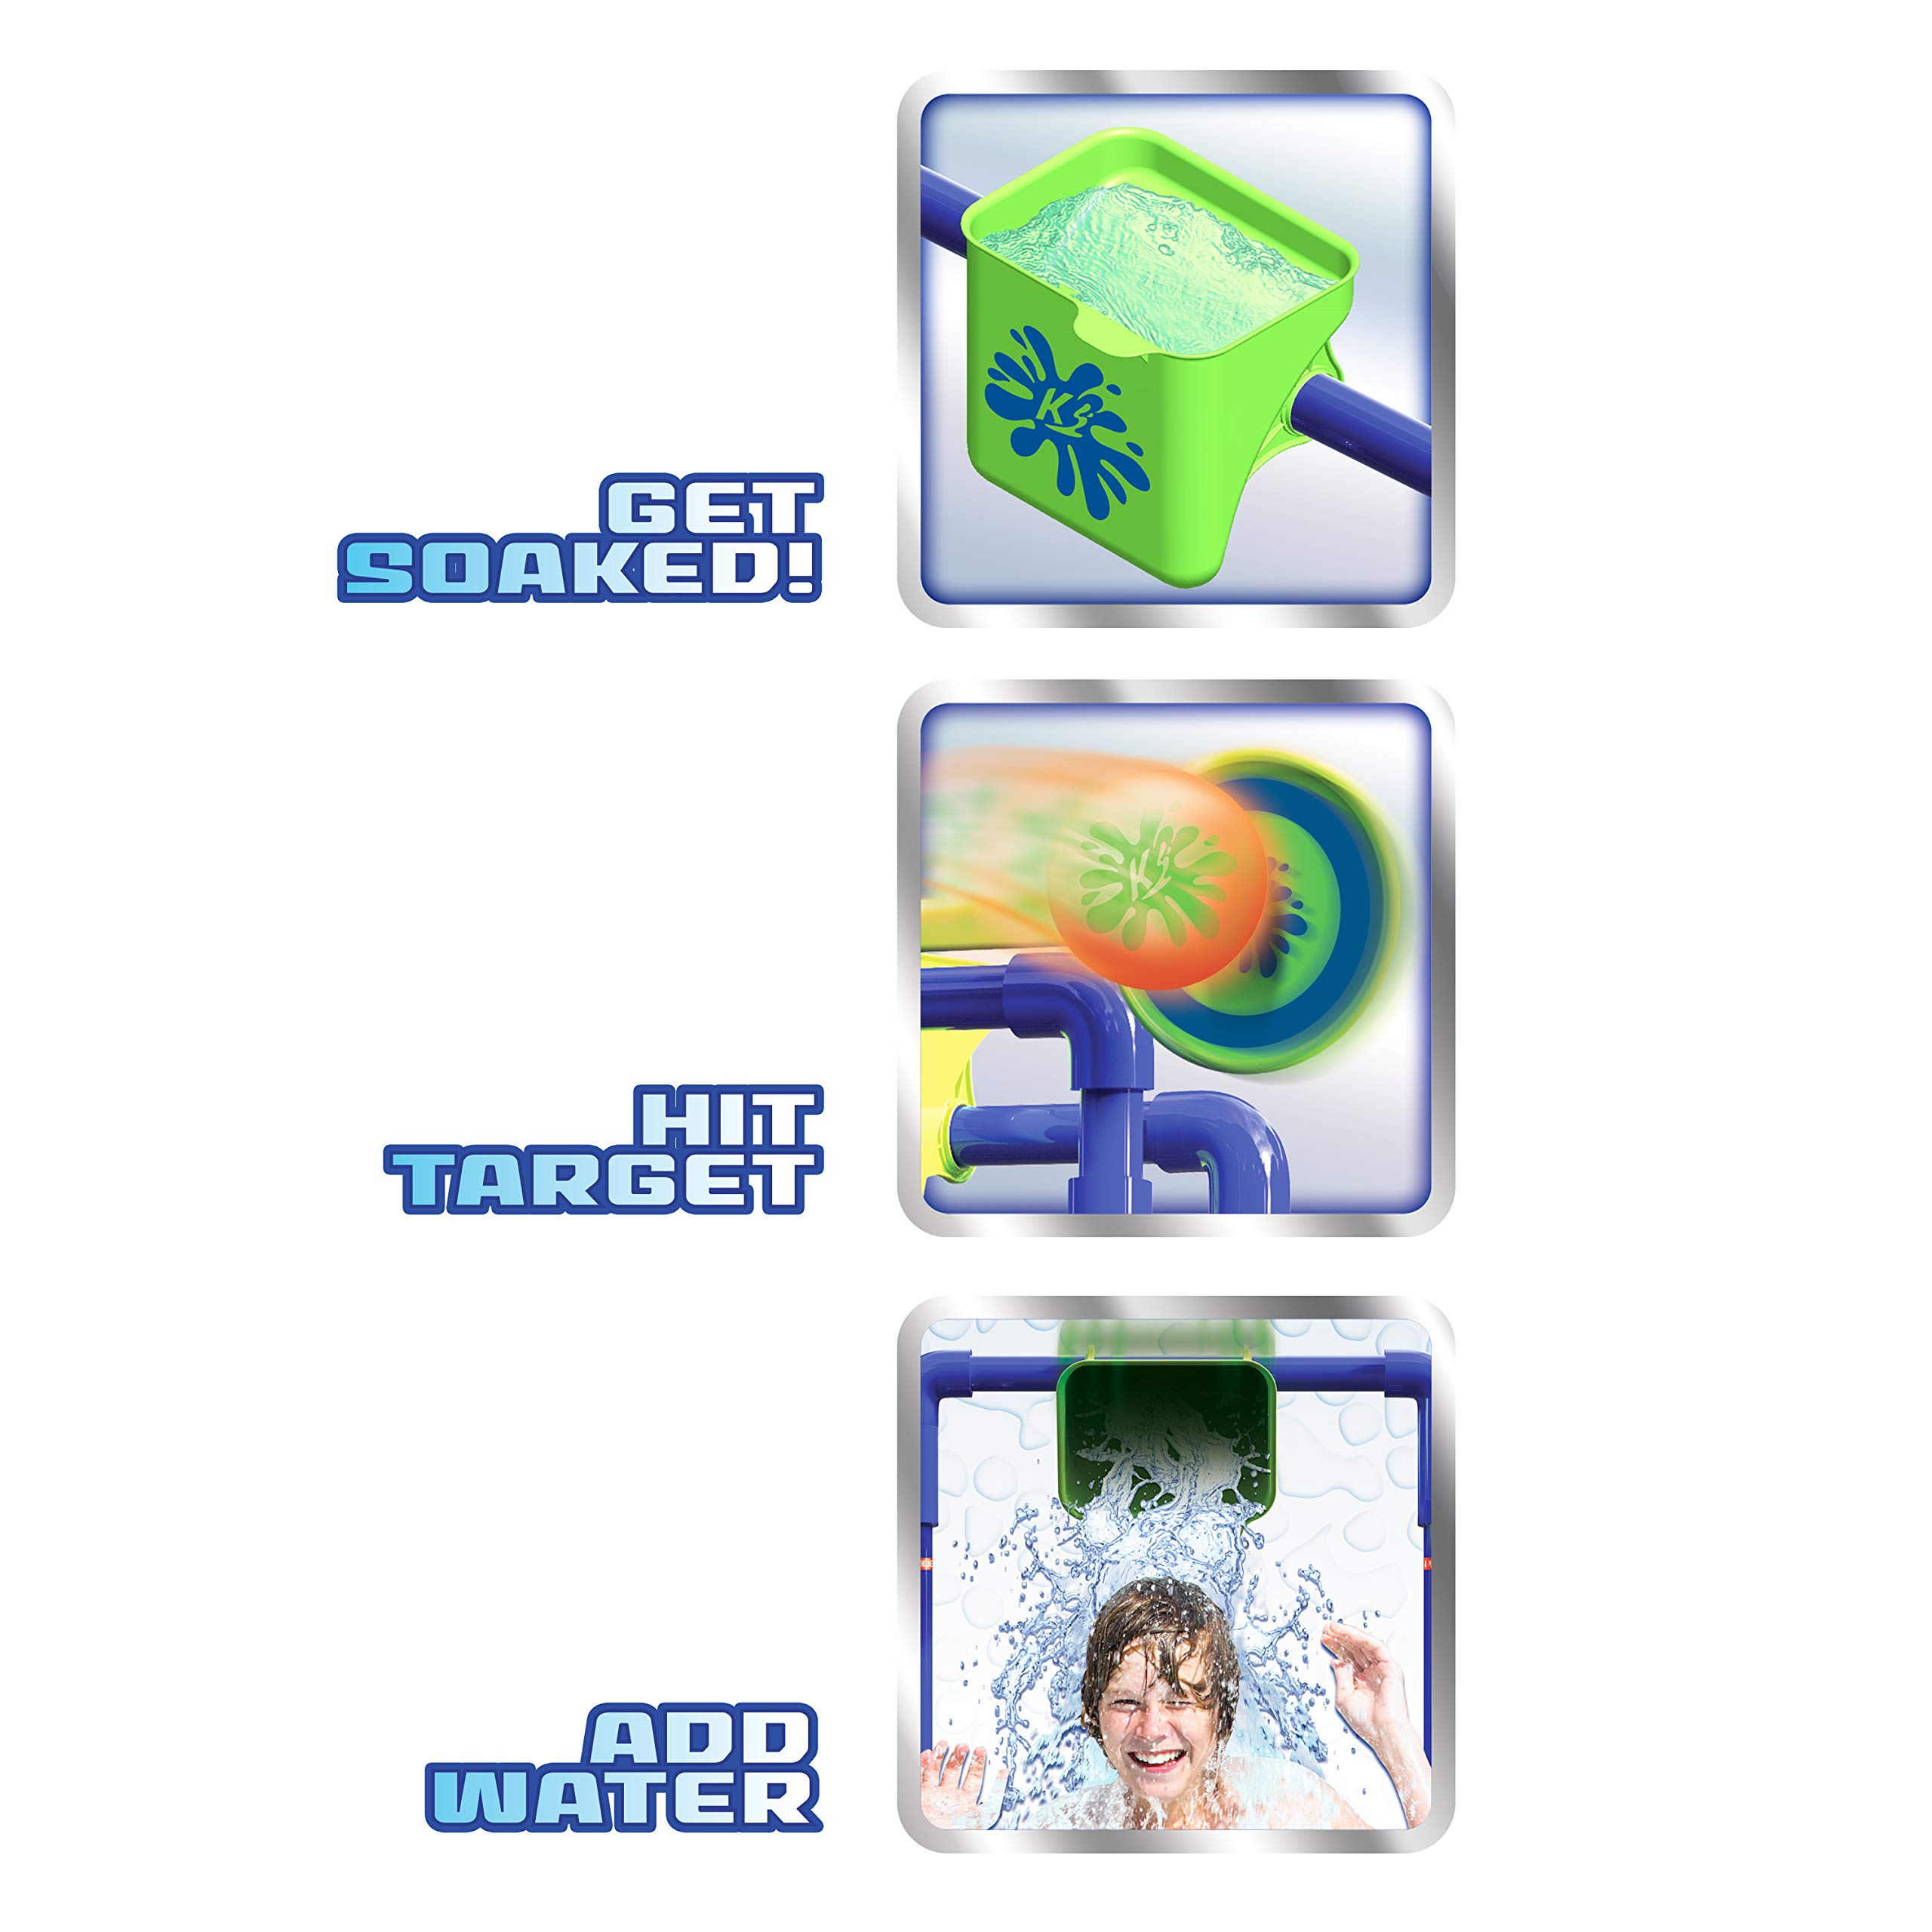 Kaos Water Play KAOS Splash Tank (Alternative Dunk Tank), Multicolor by Kaos Water Play (Image #4)